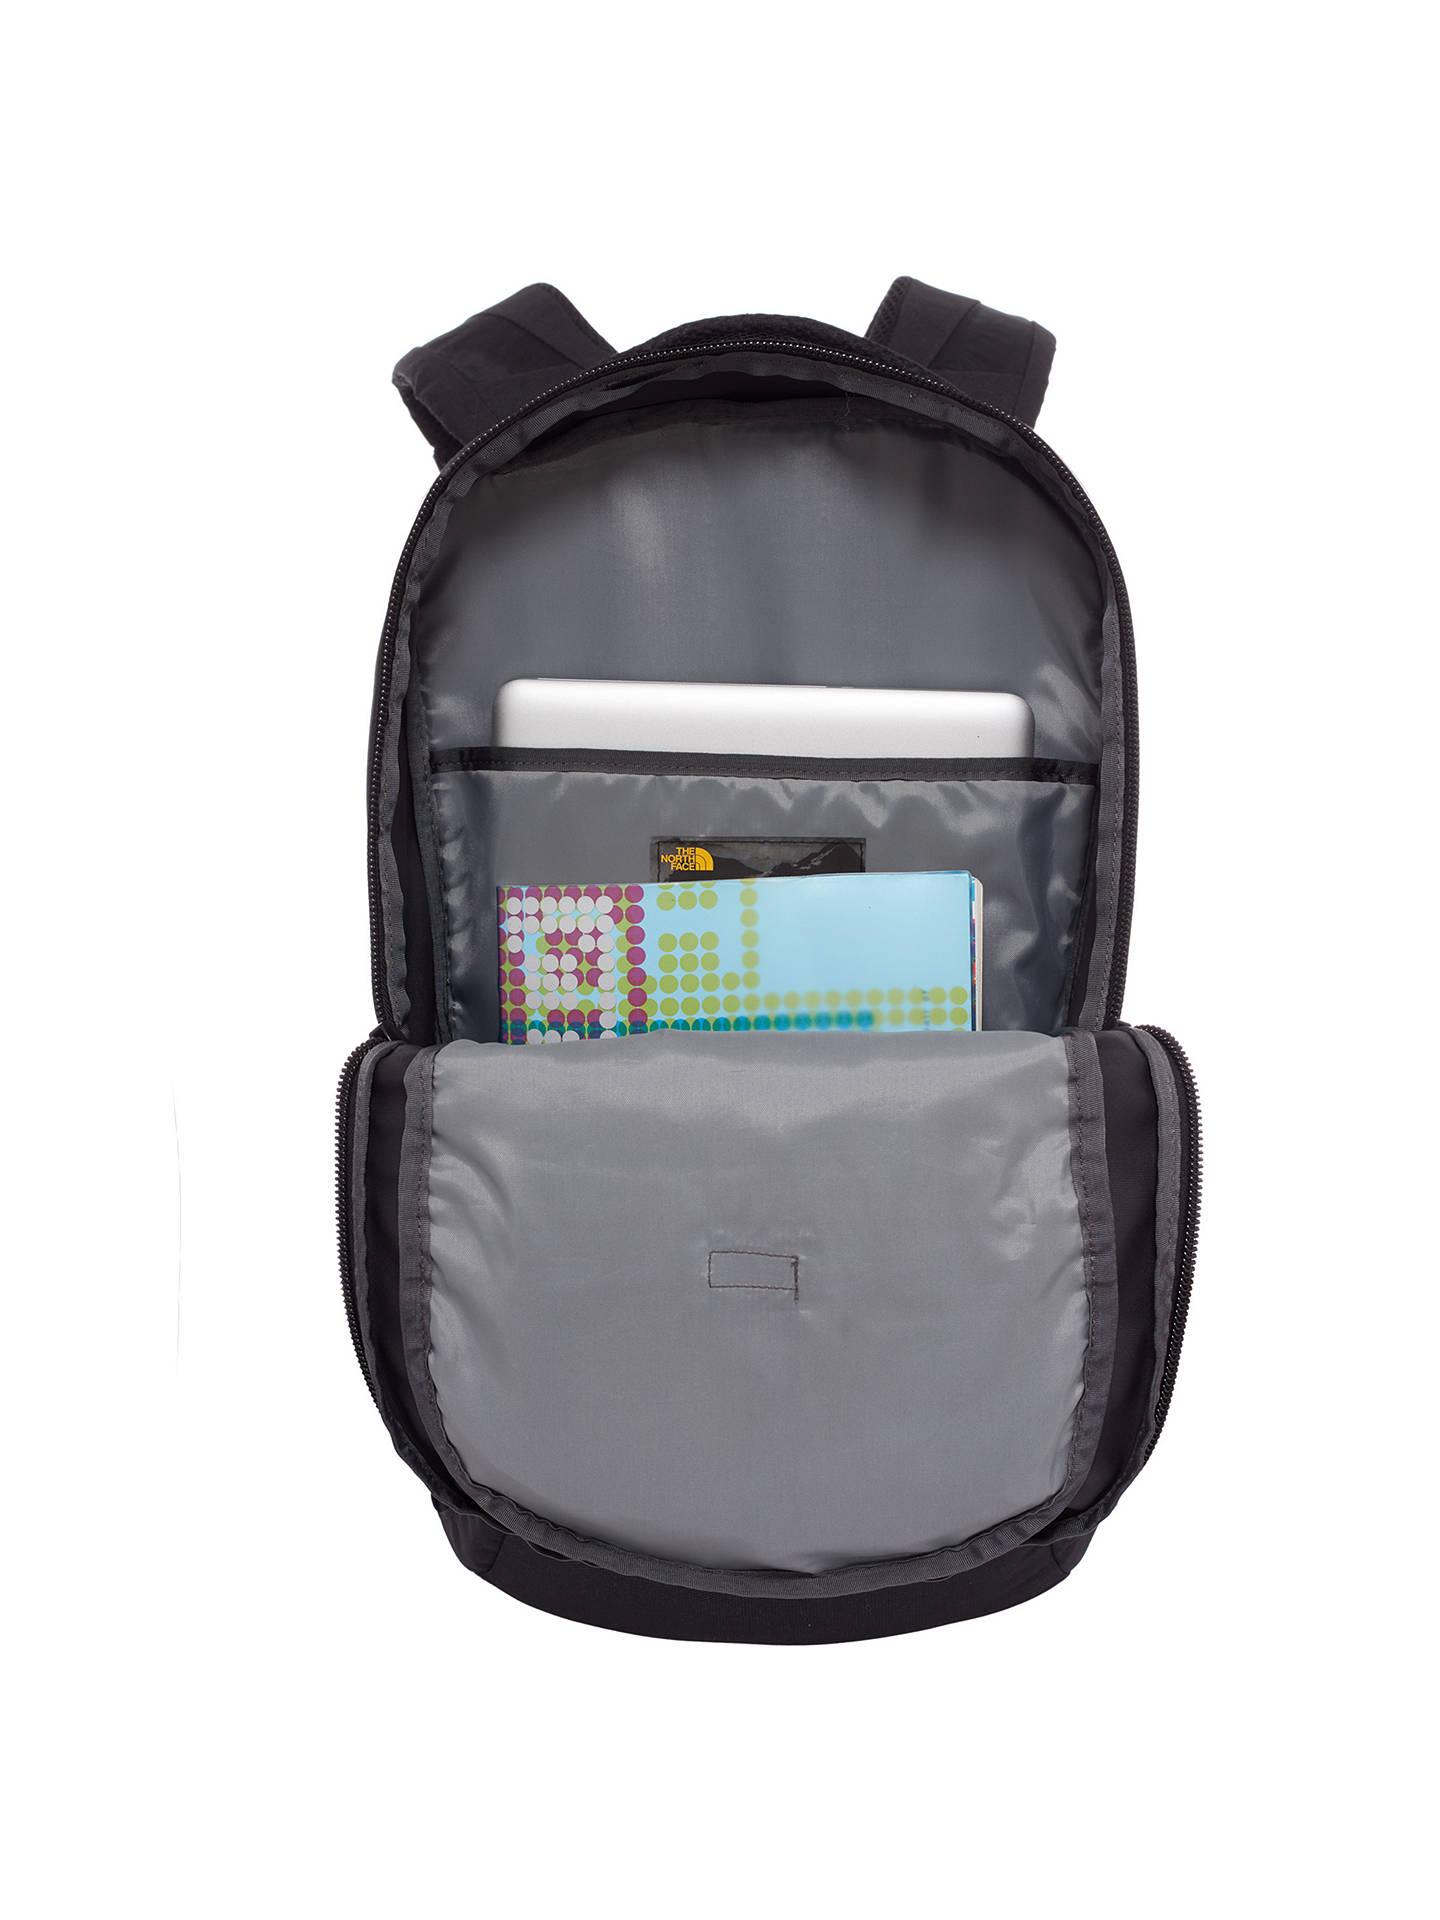 Oppdatert The North Face Vault Backpack, Black at John Lewis & Partners MJ-21